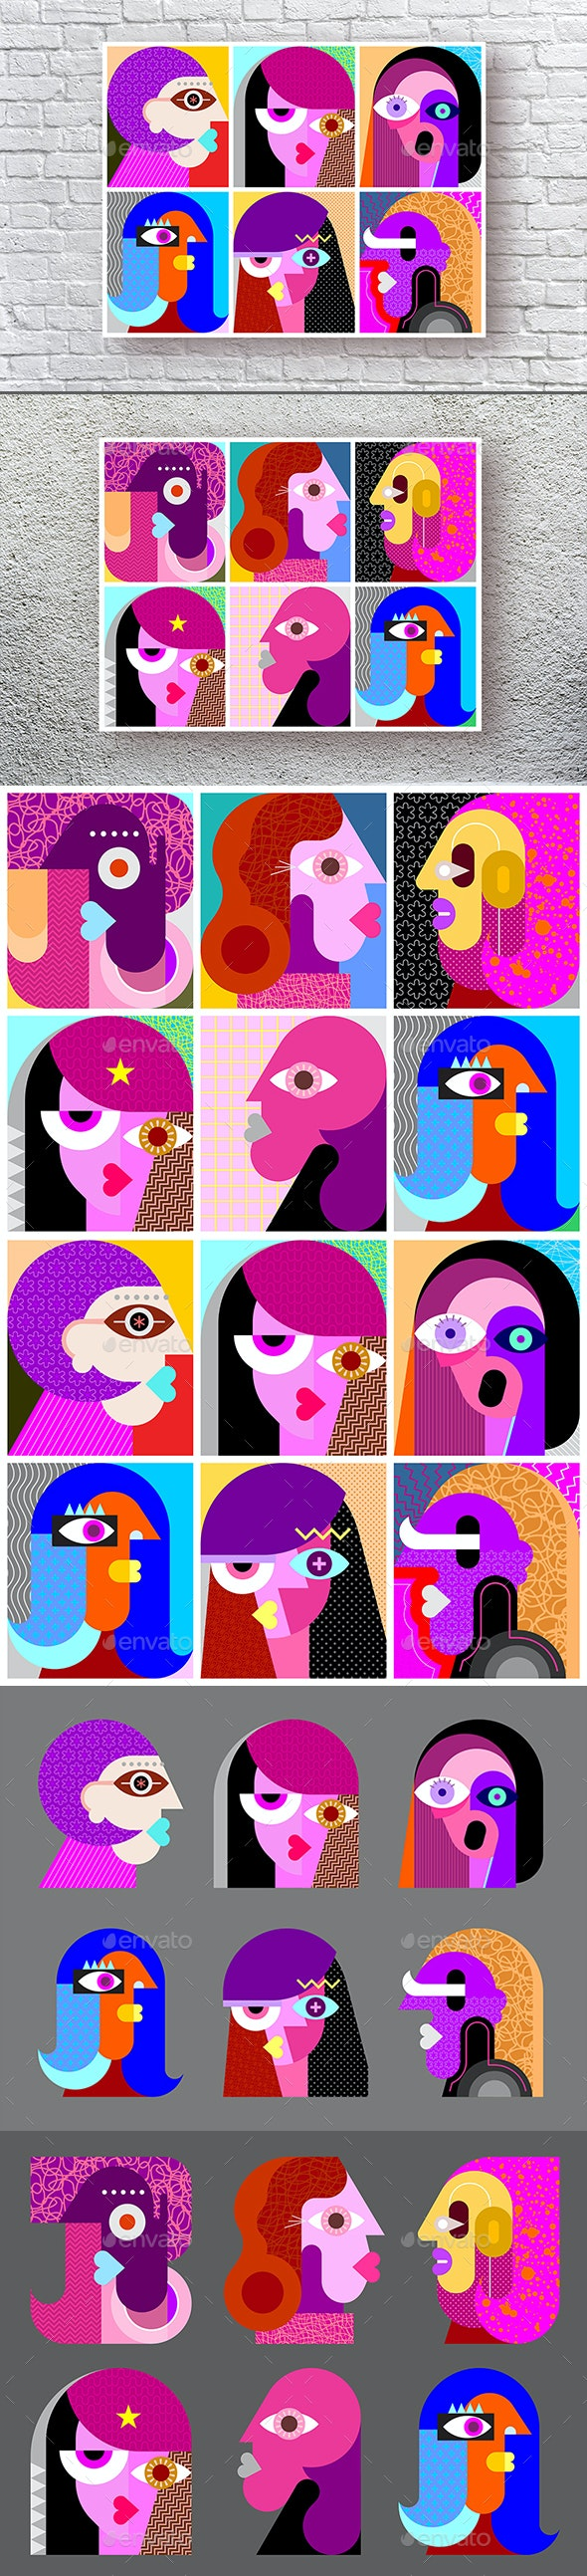 Twelve Abstract Vector Portraits - People Characters